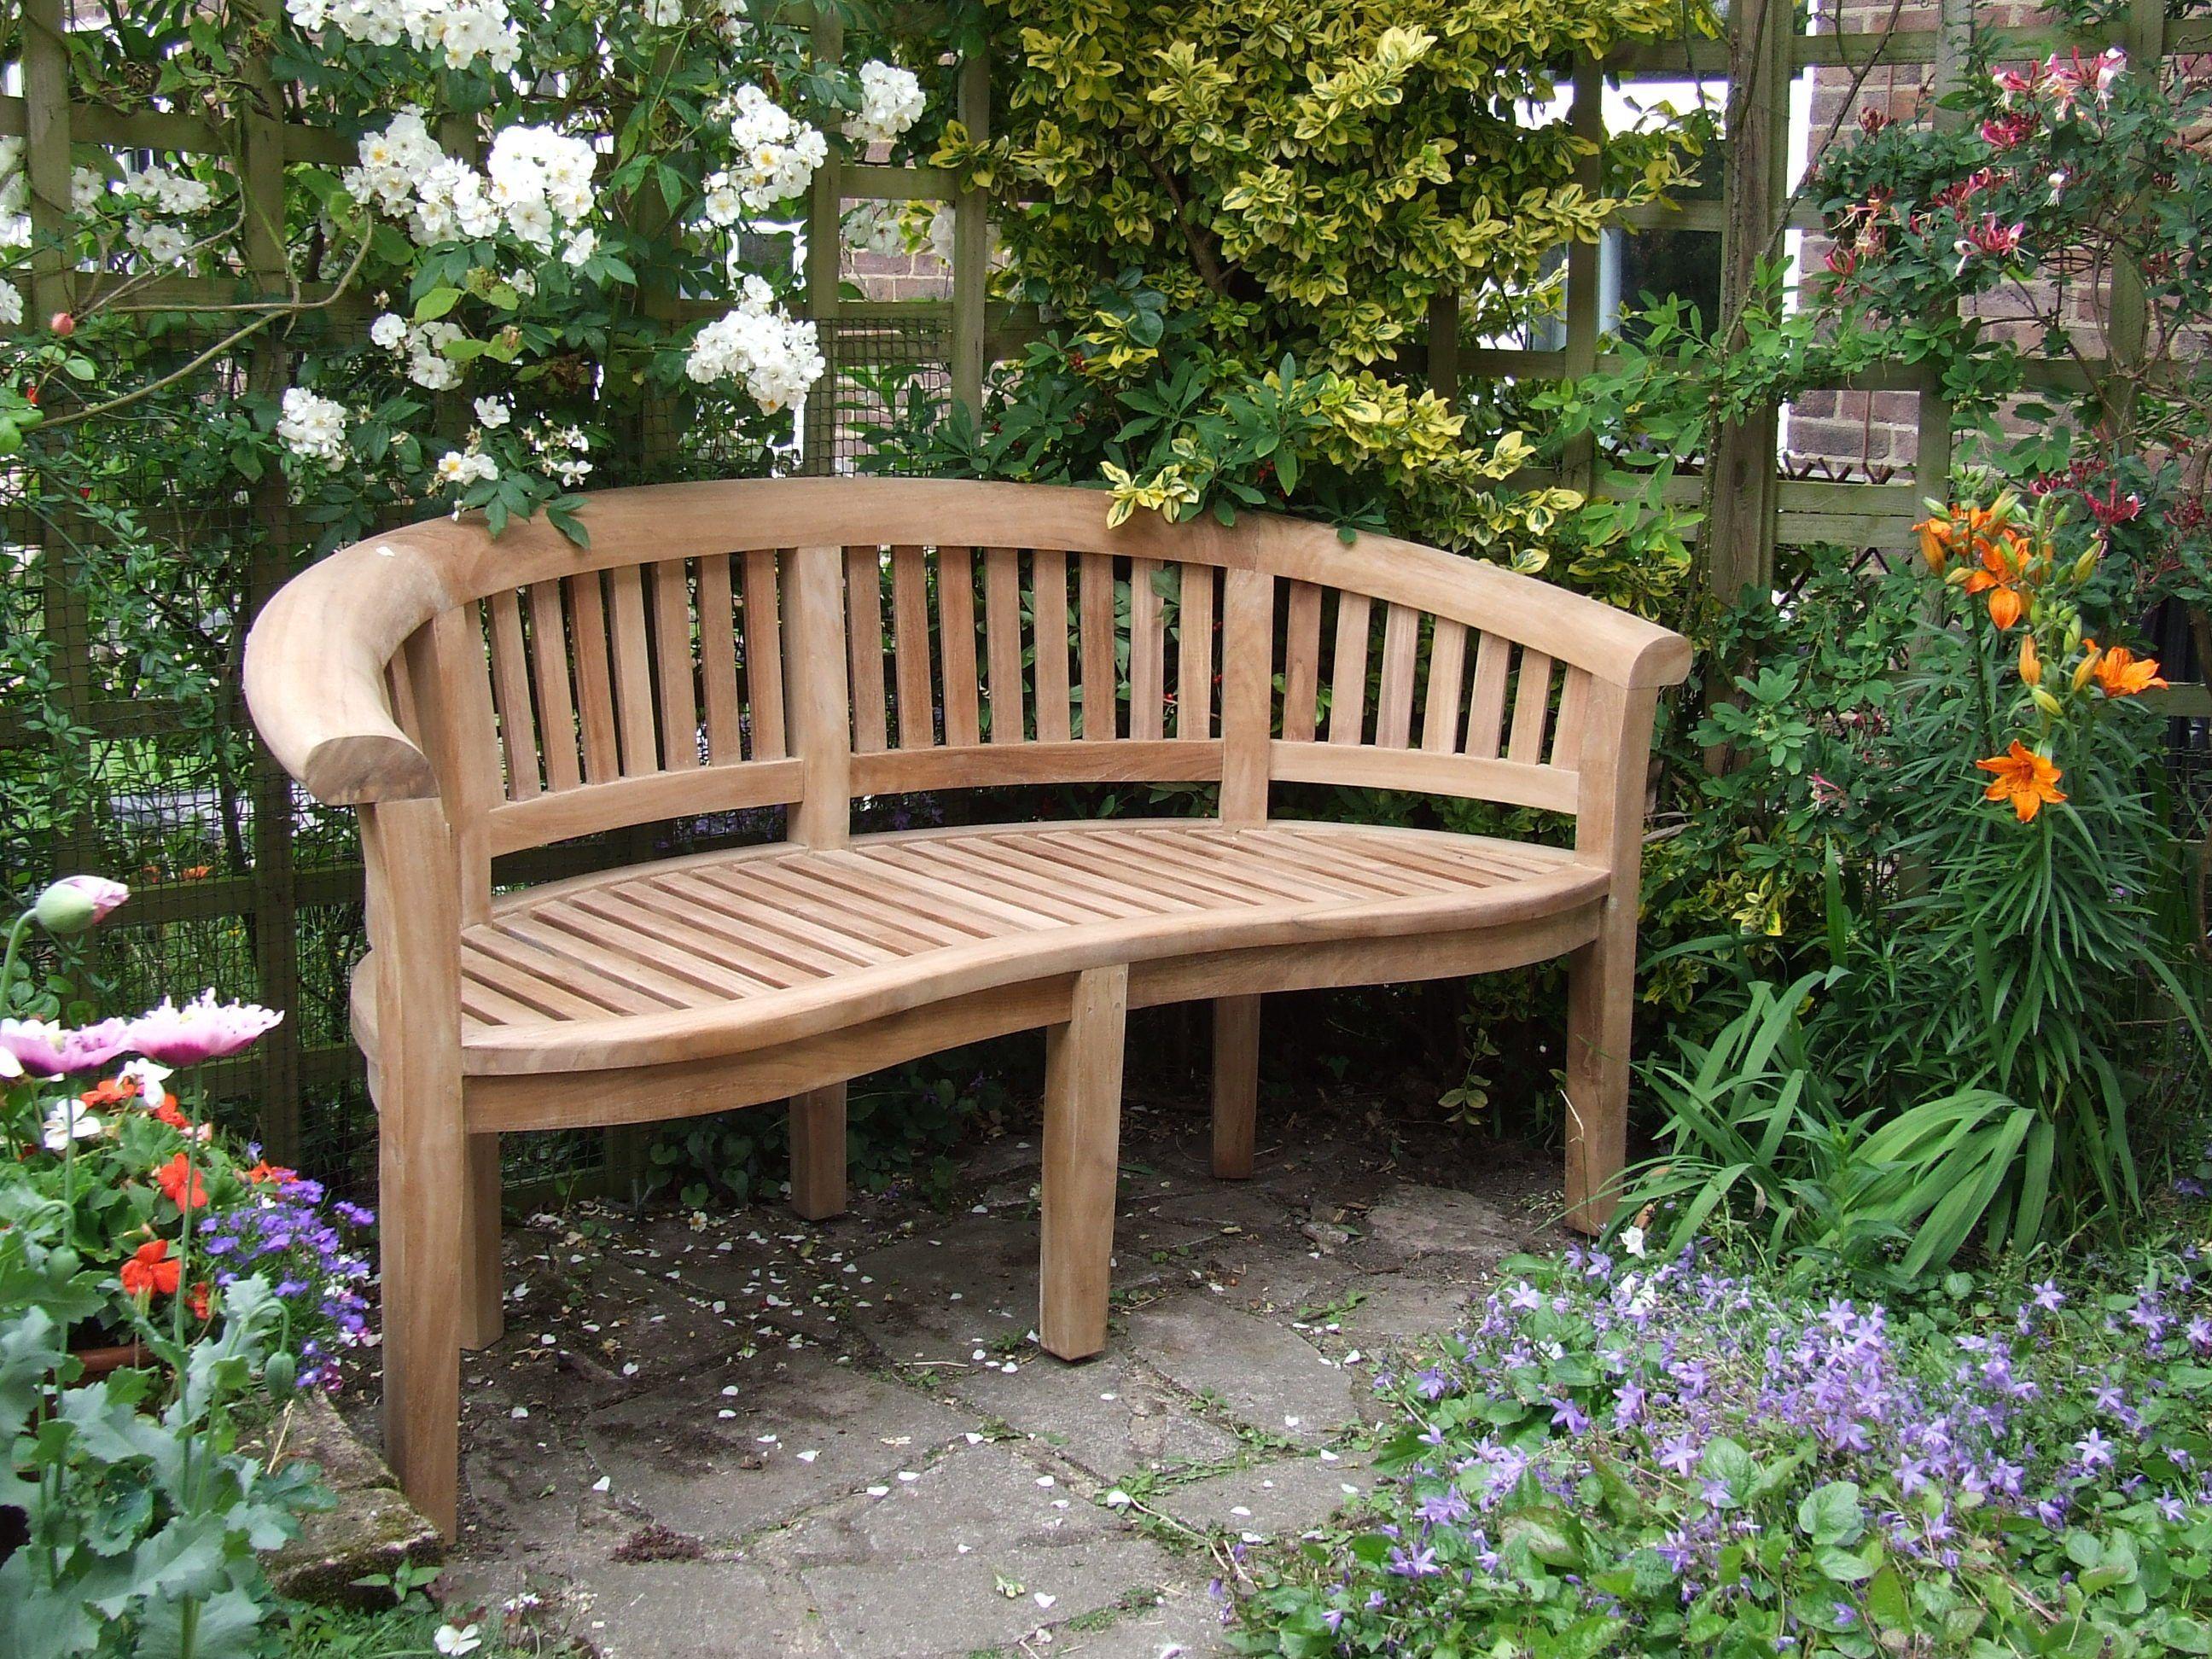 Creative Yet Natural Garden Bench Outdoor Furniture Natural Look